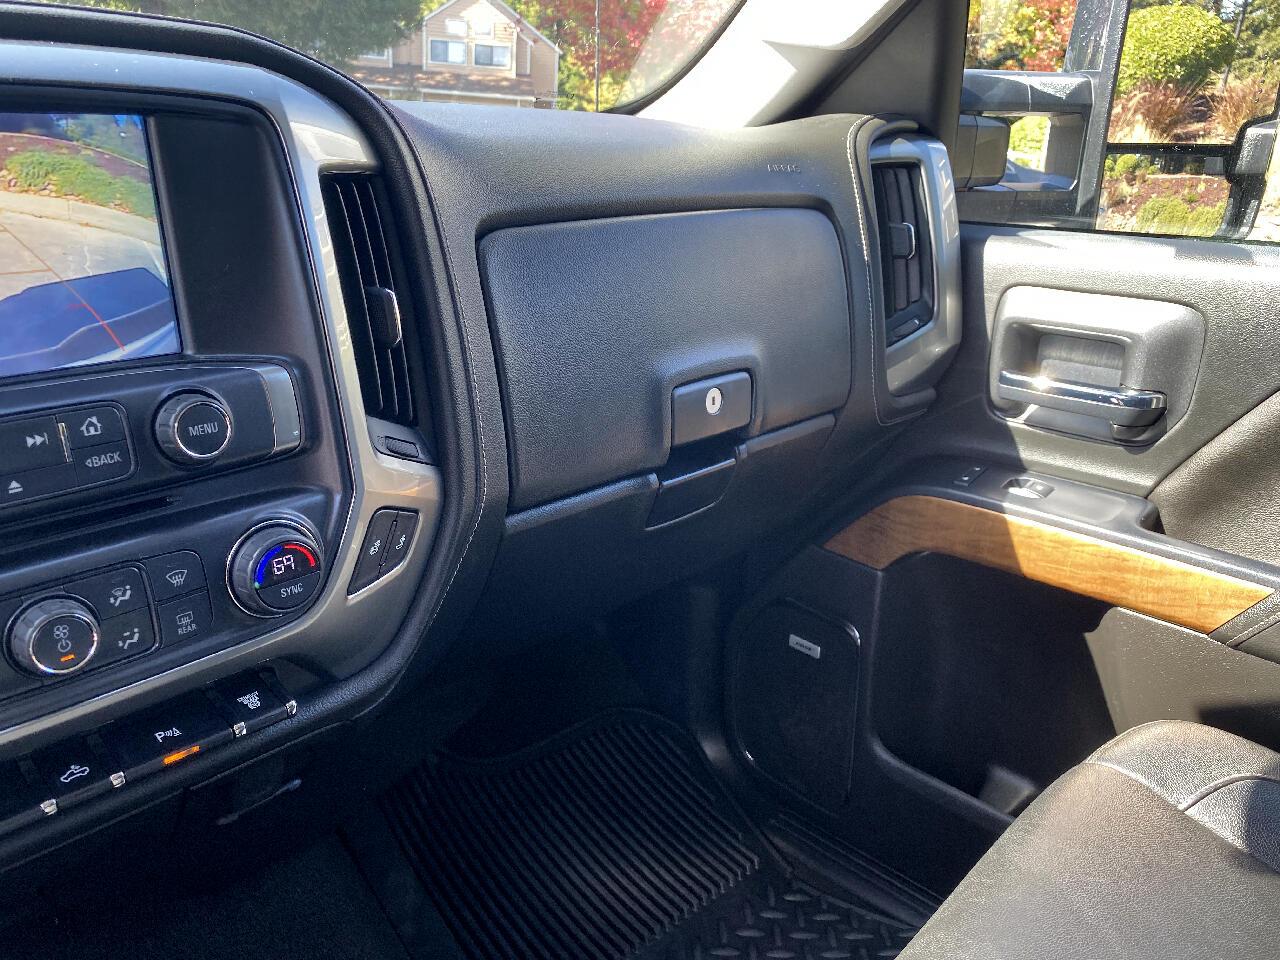 2018 Chevrolet Silverado 2500HD LTZ Crew Cab Short Box 4WD